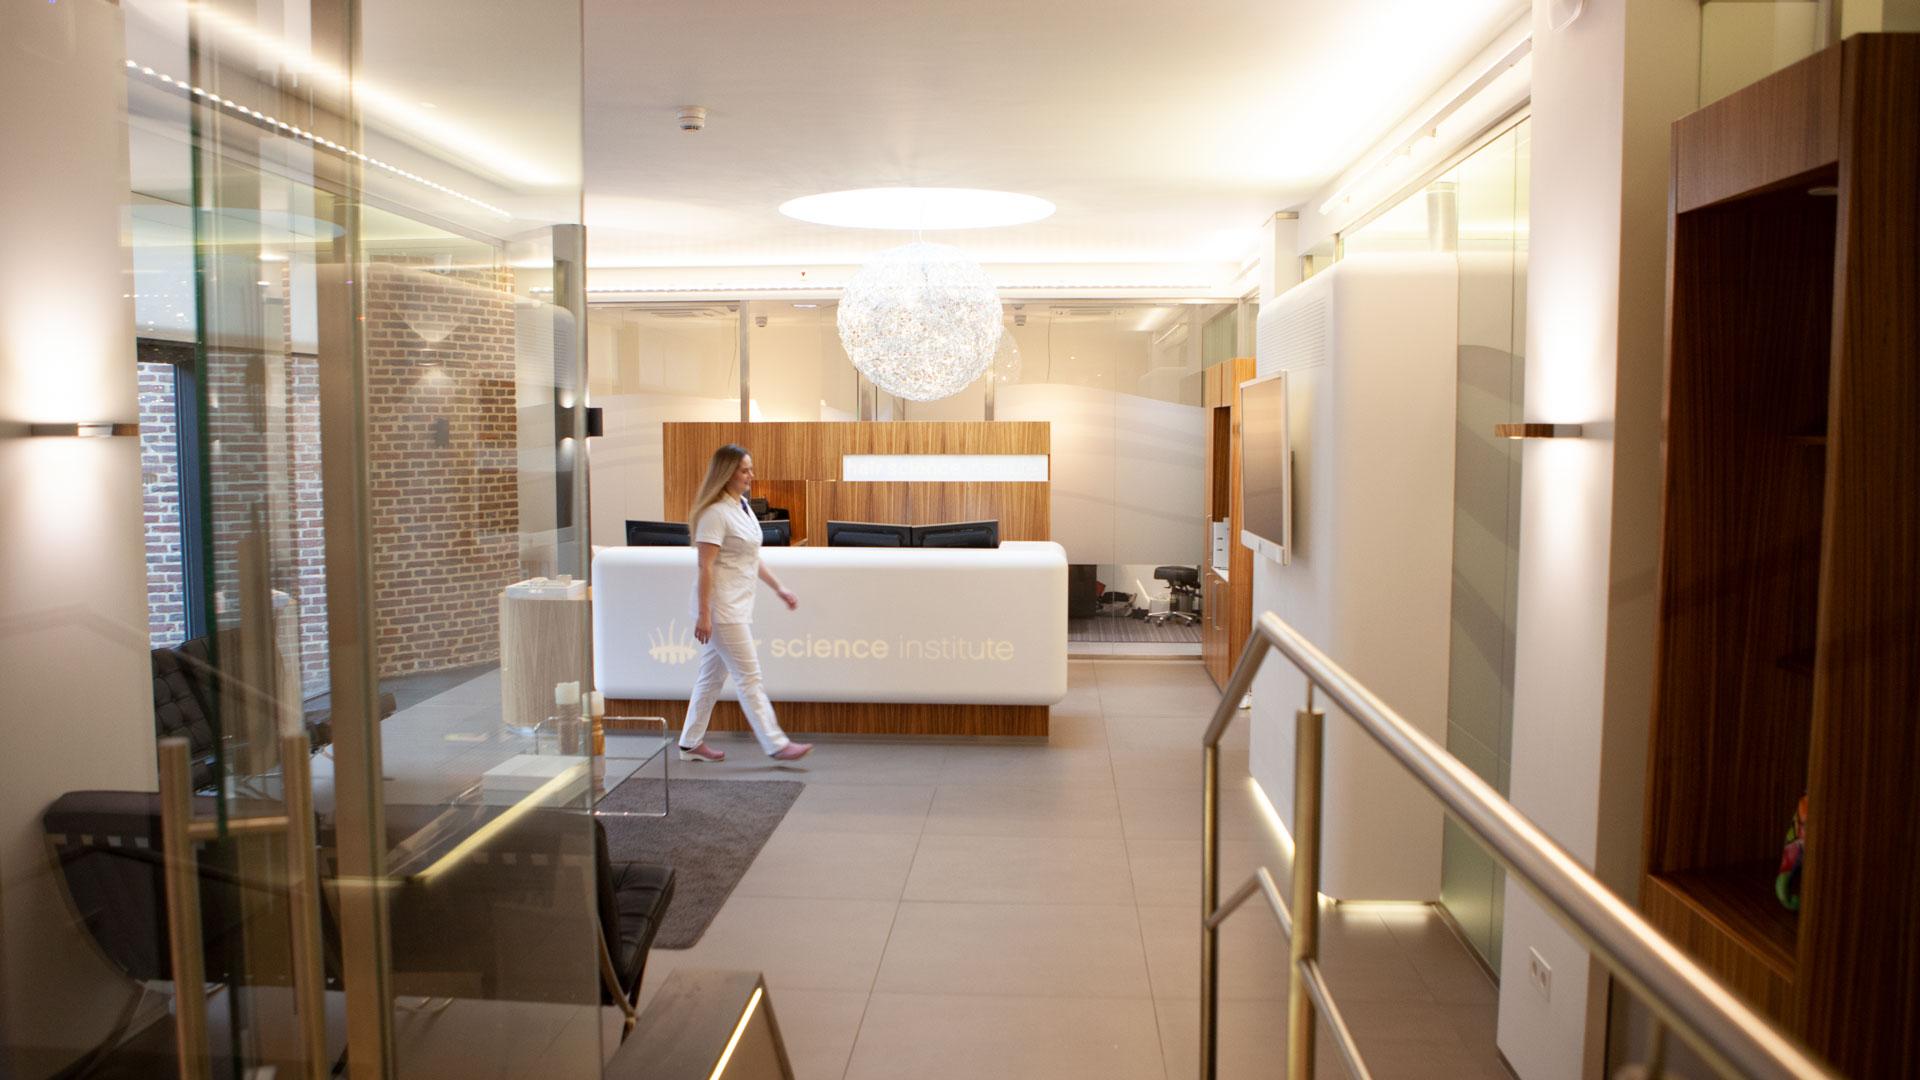 Entree kliniek Maastricht